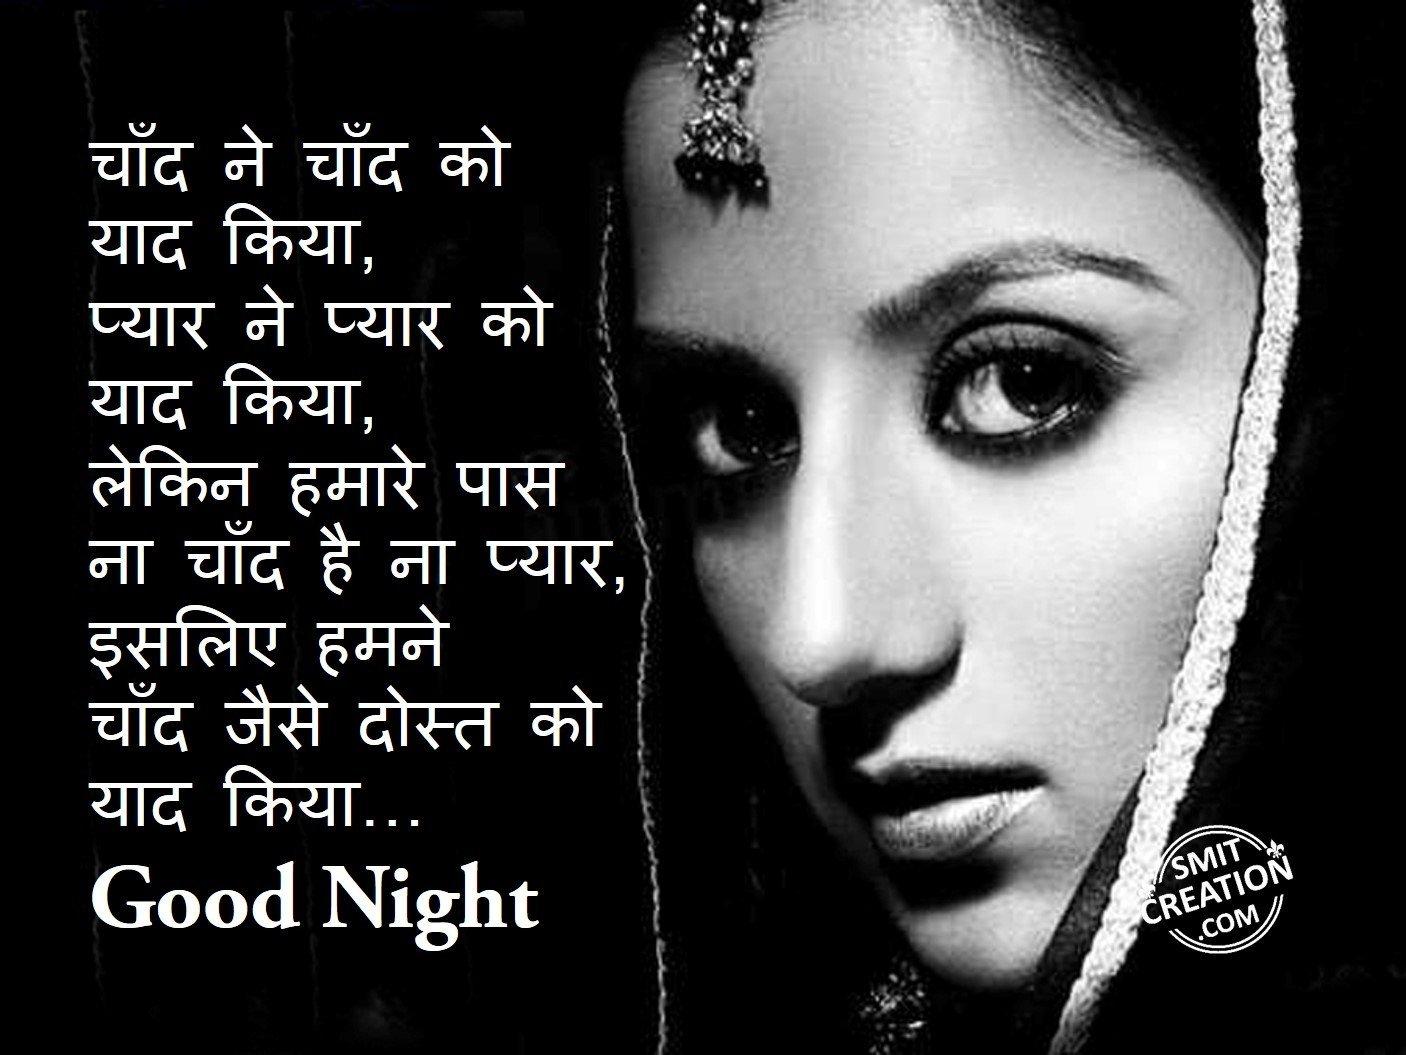 Good Night Smitcreationcom